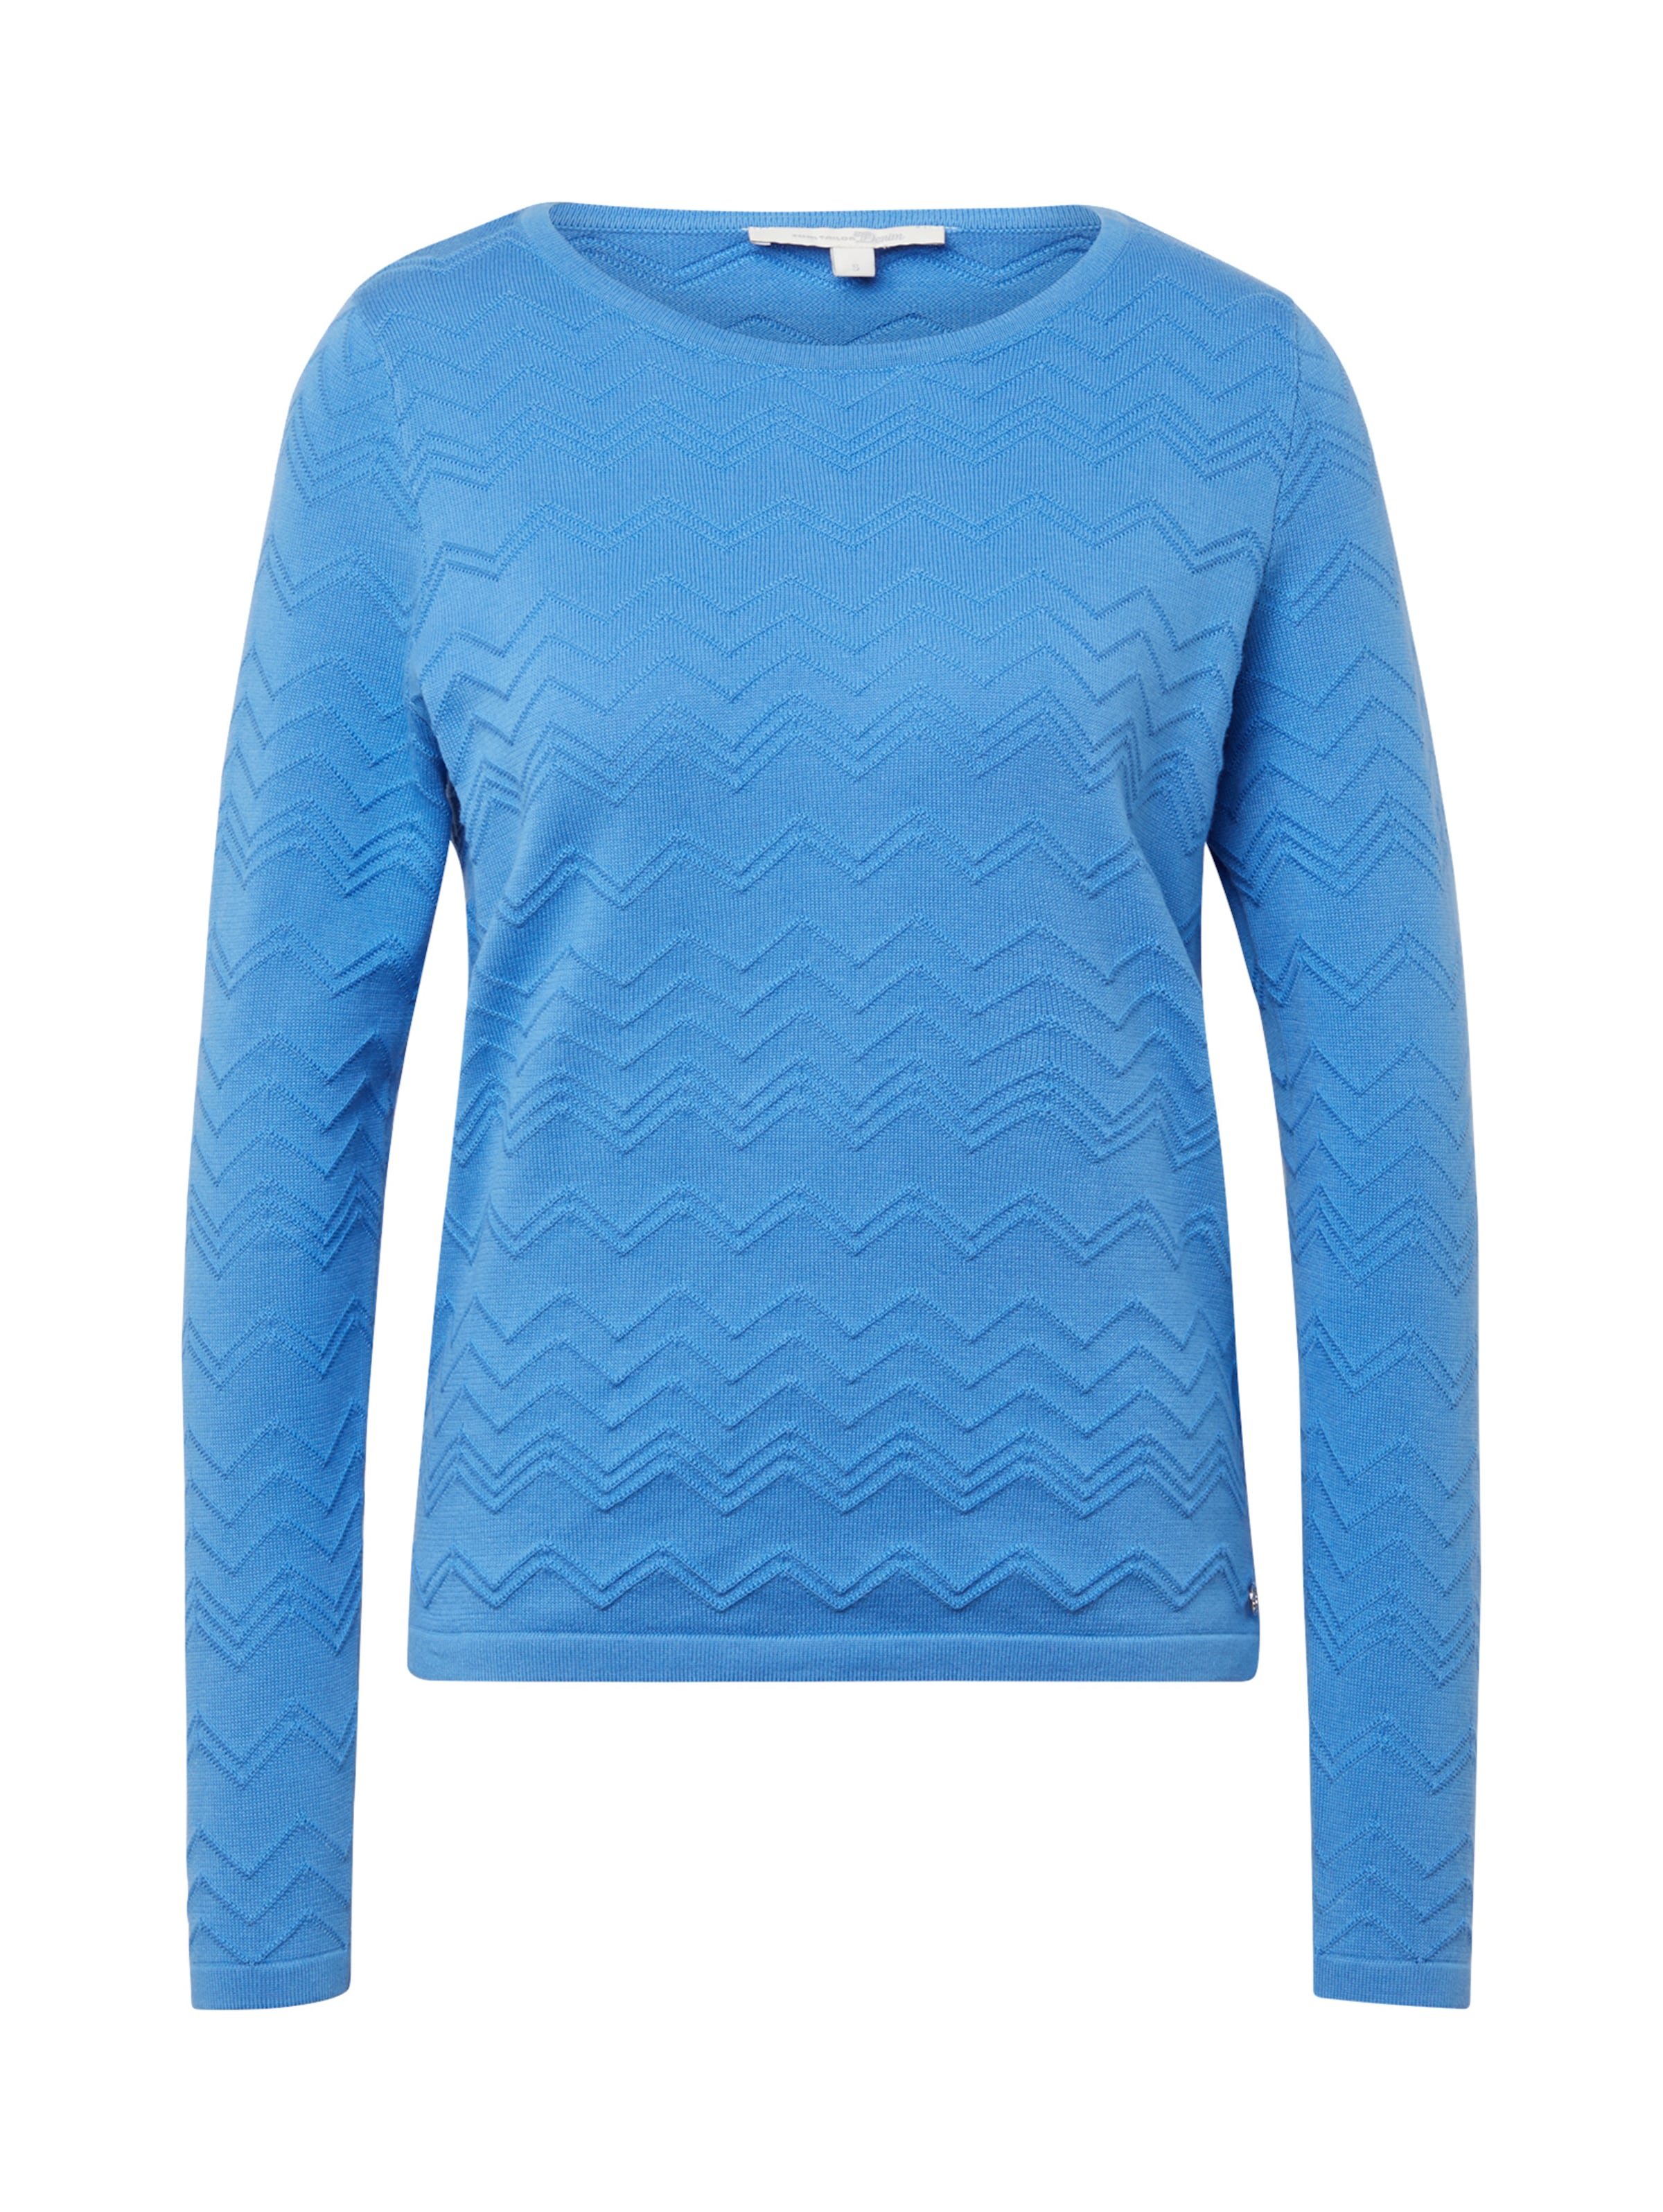 Hellblau Tailor Denim In Pullover Tom roWBdCxe